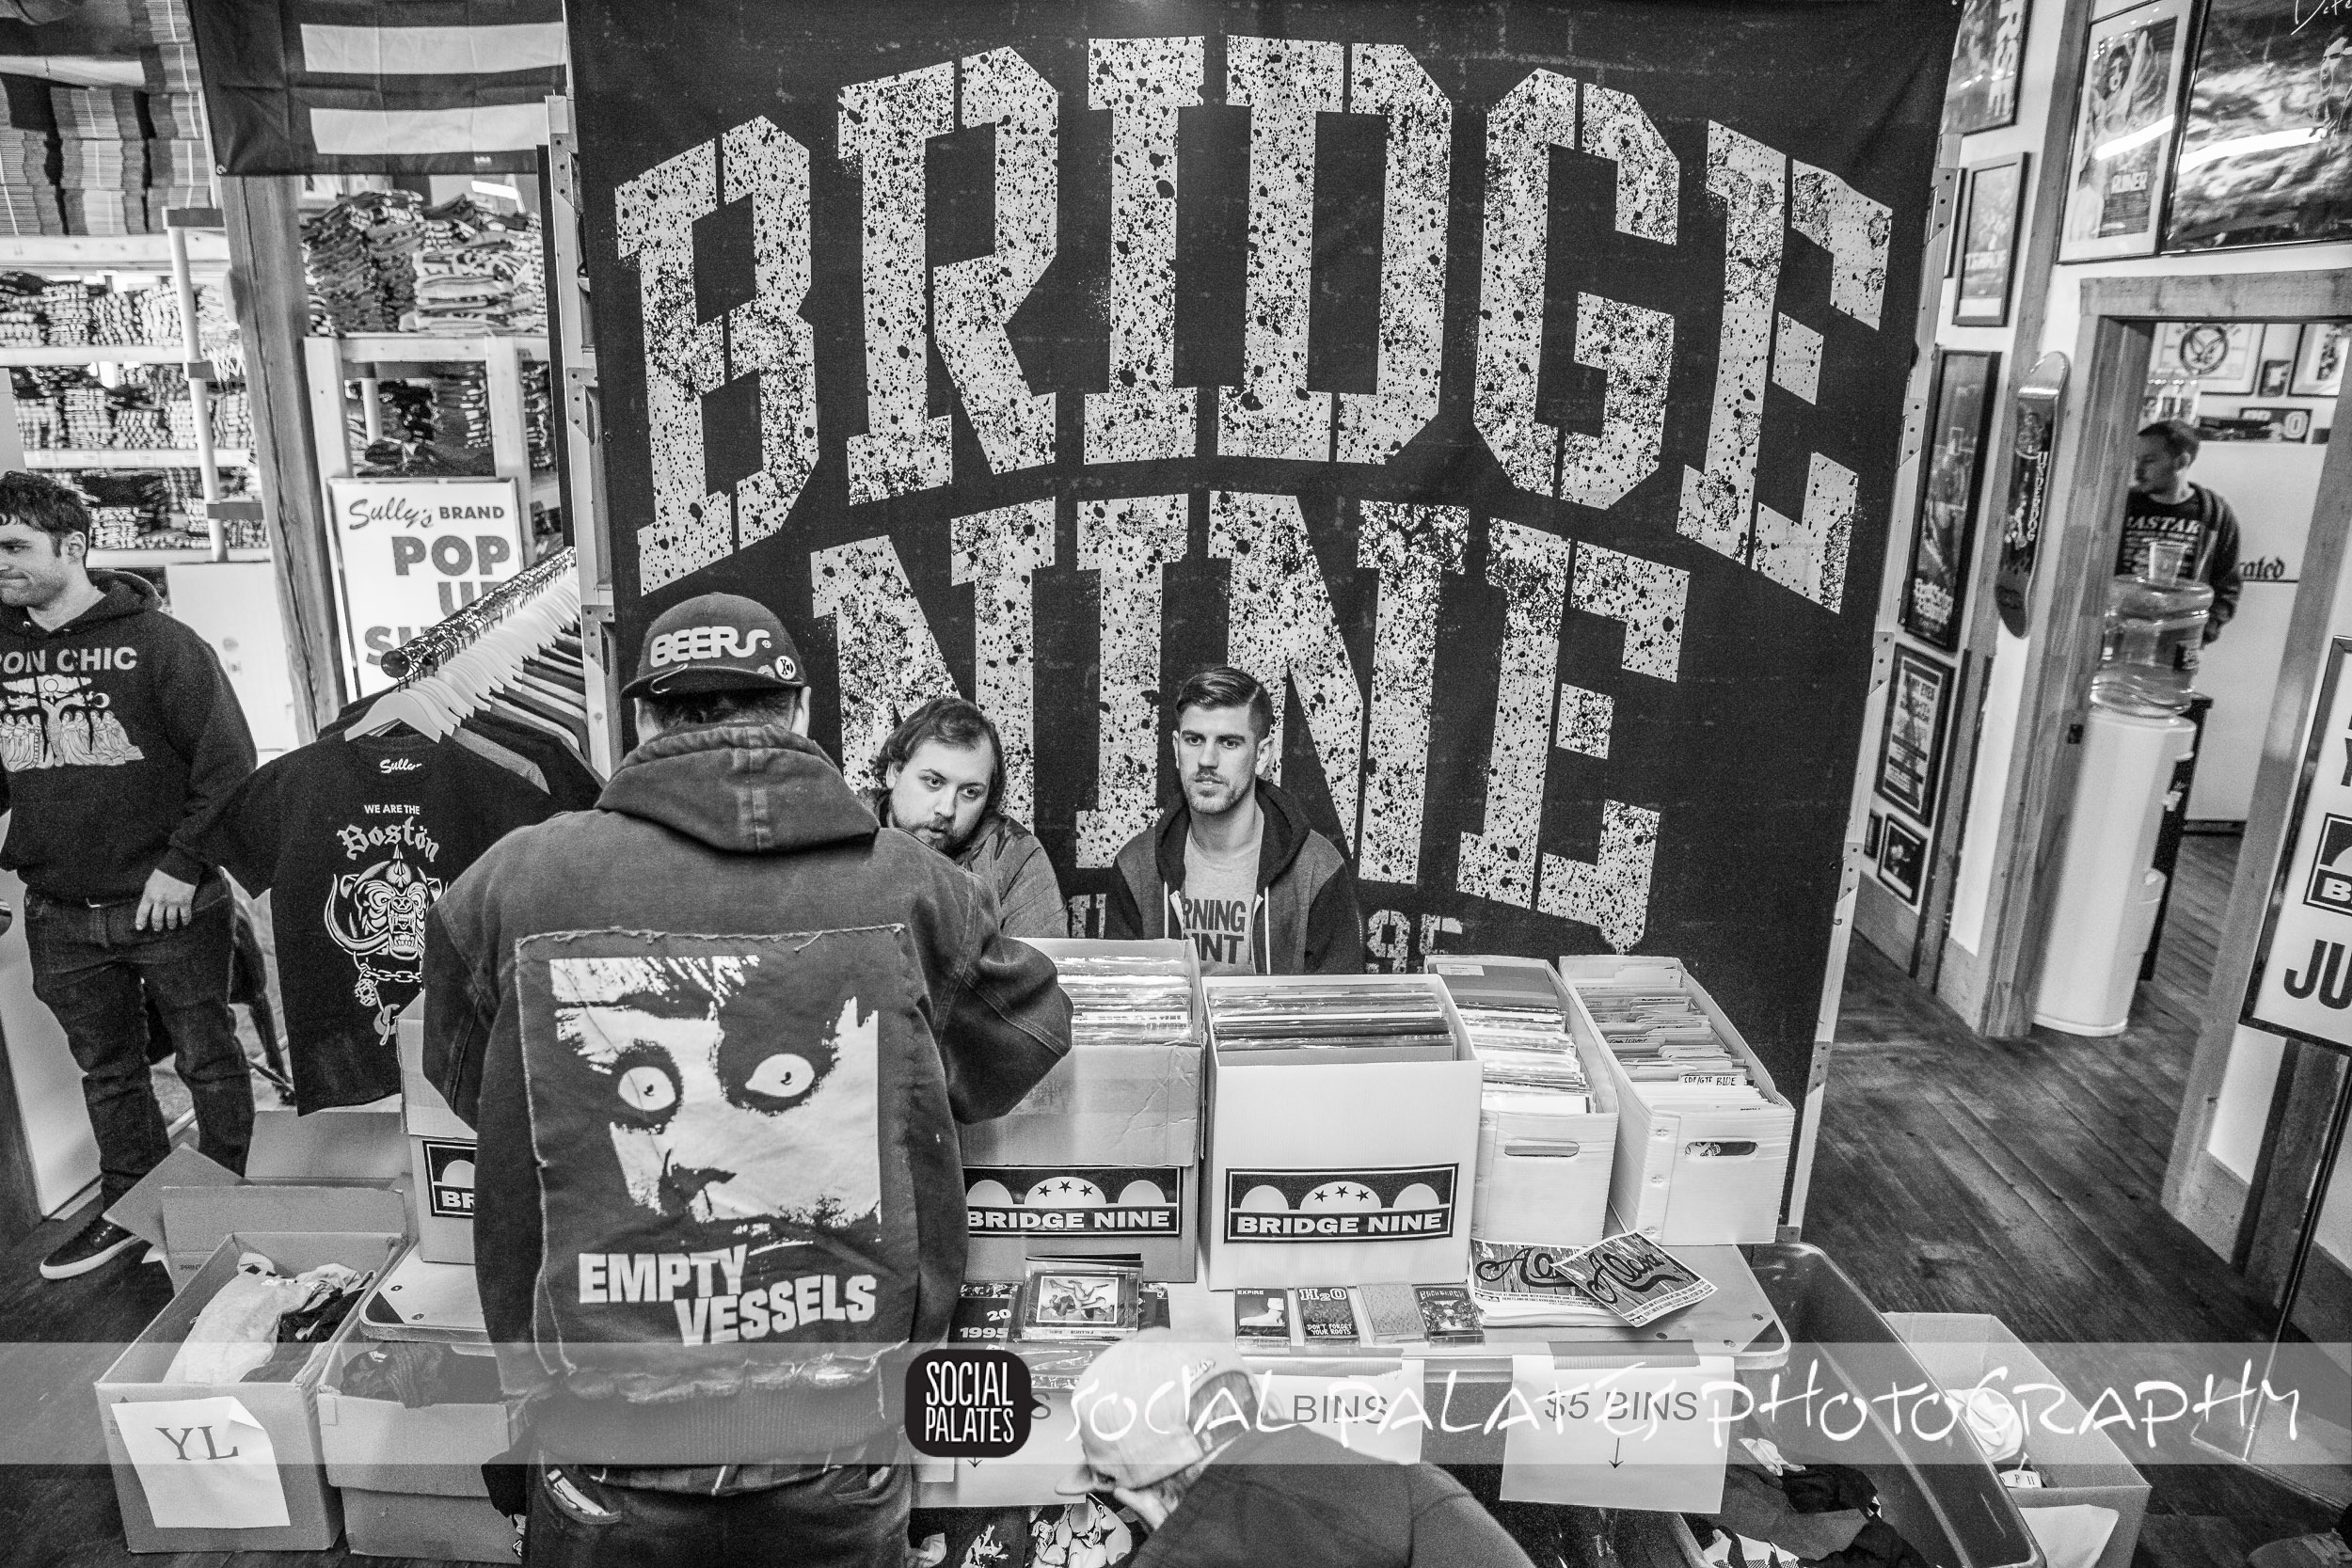 Bridge Nine Punk Rock Flea Market Social Palates-5637.jpg